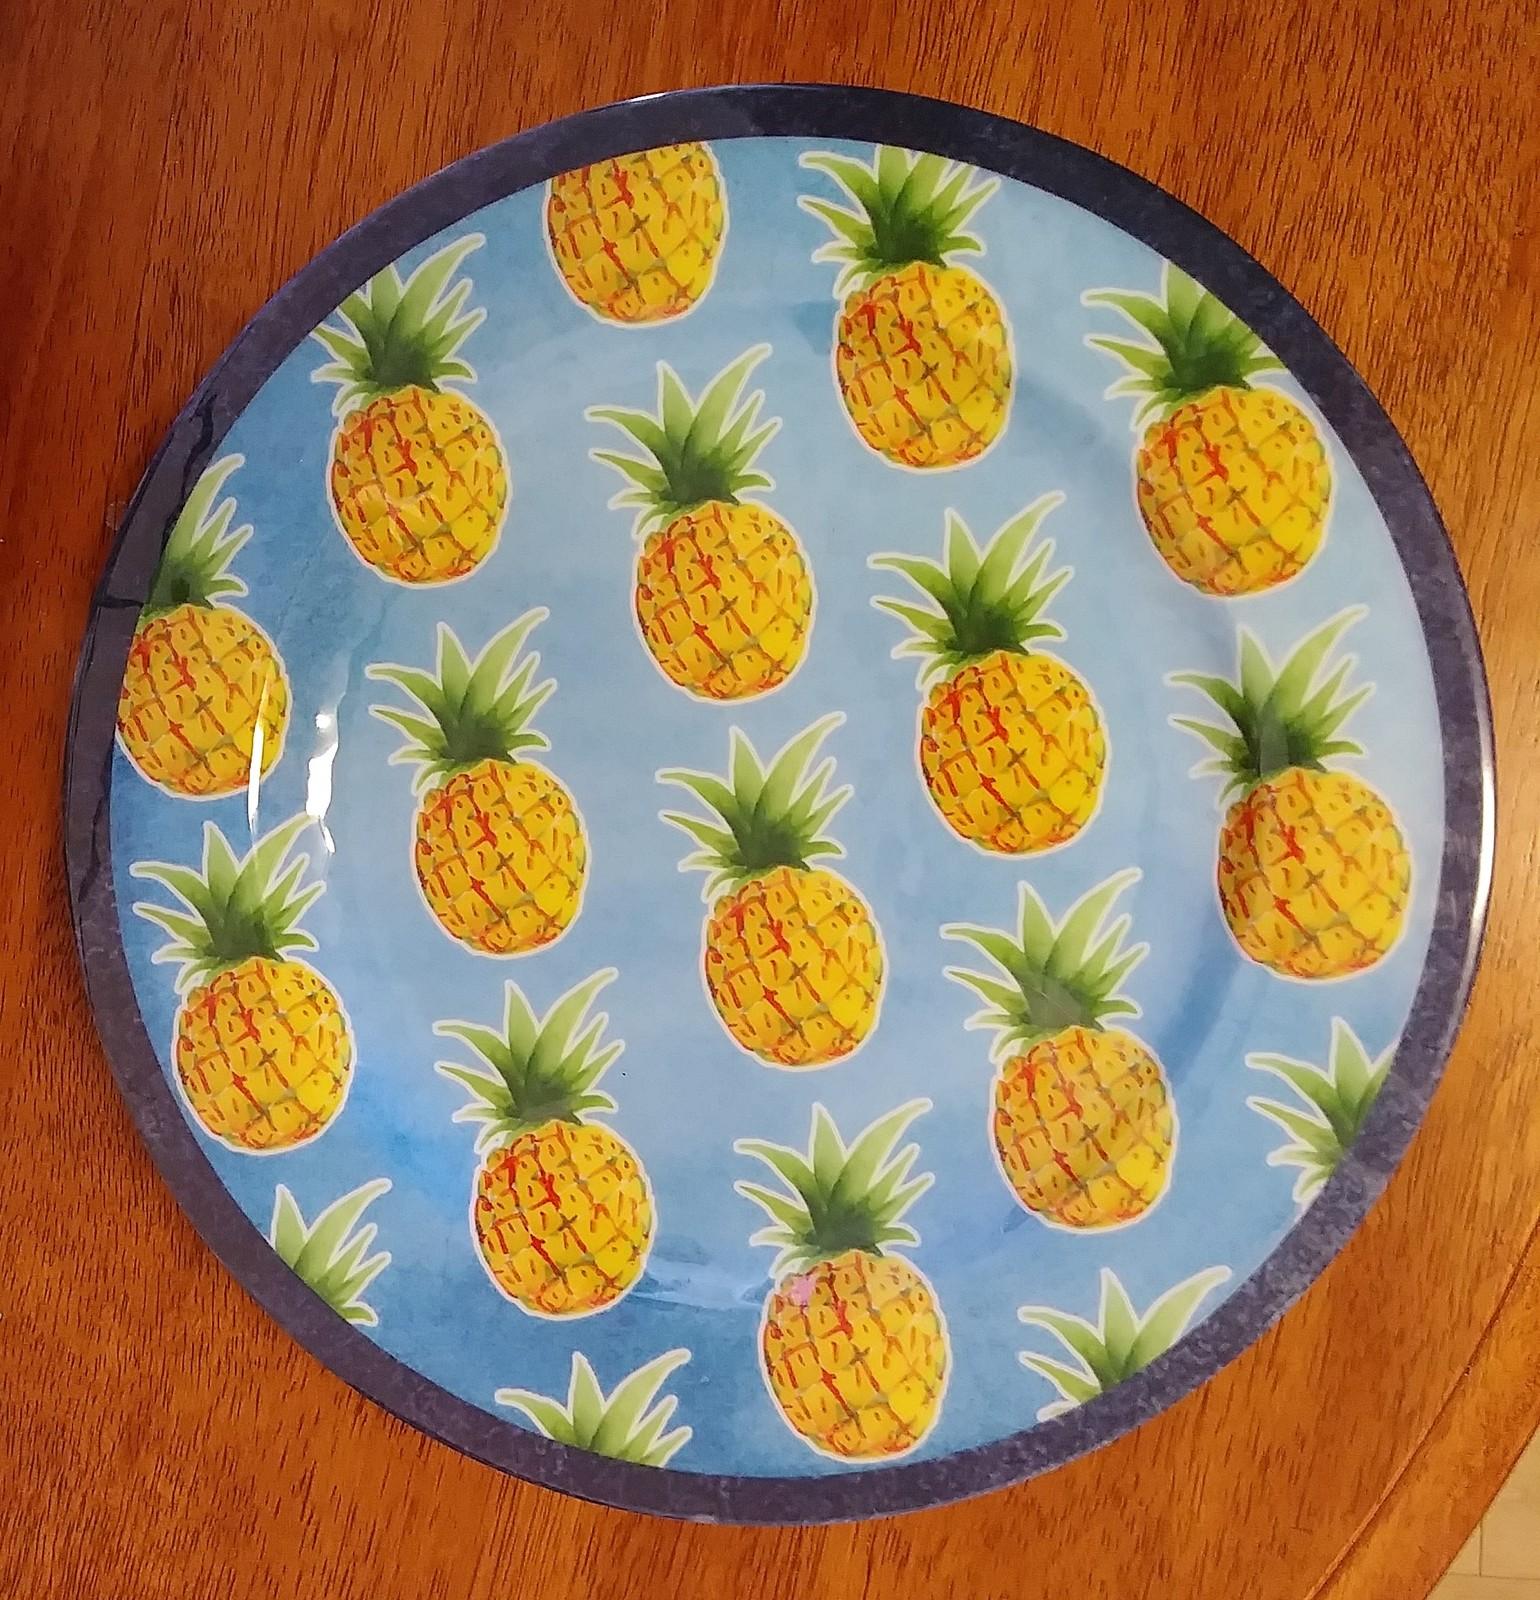 Pineappleplate 1